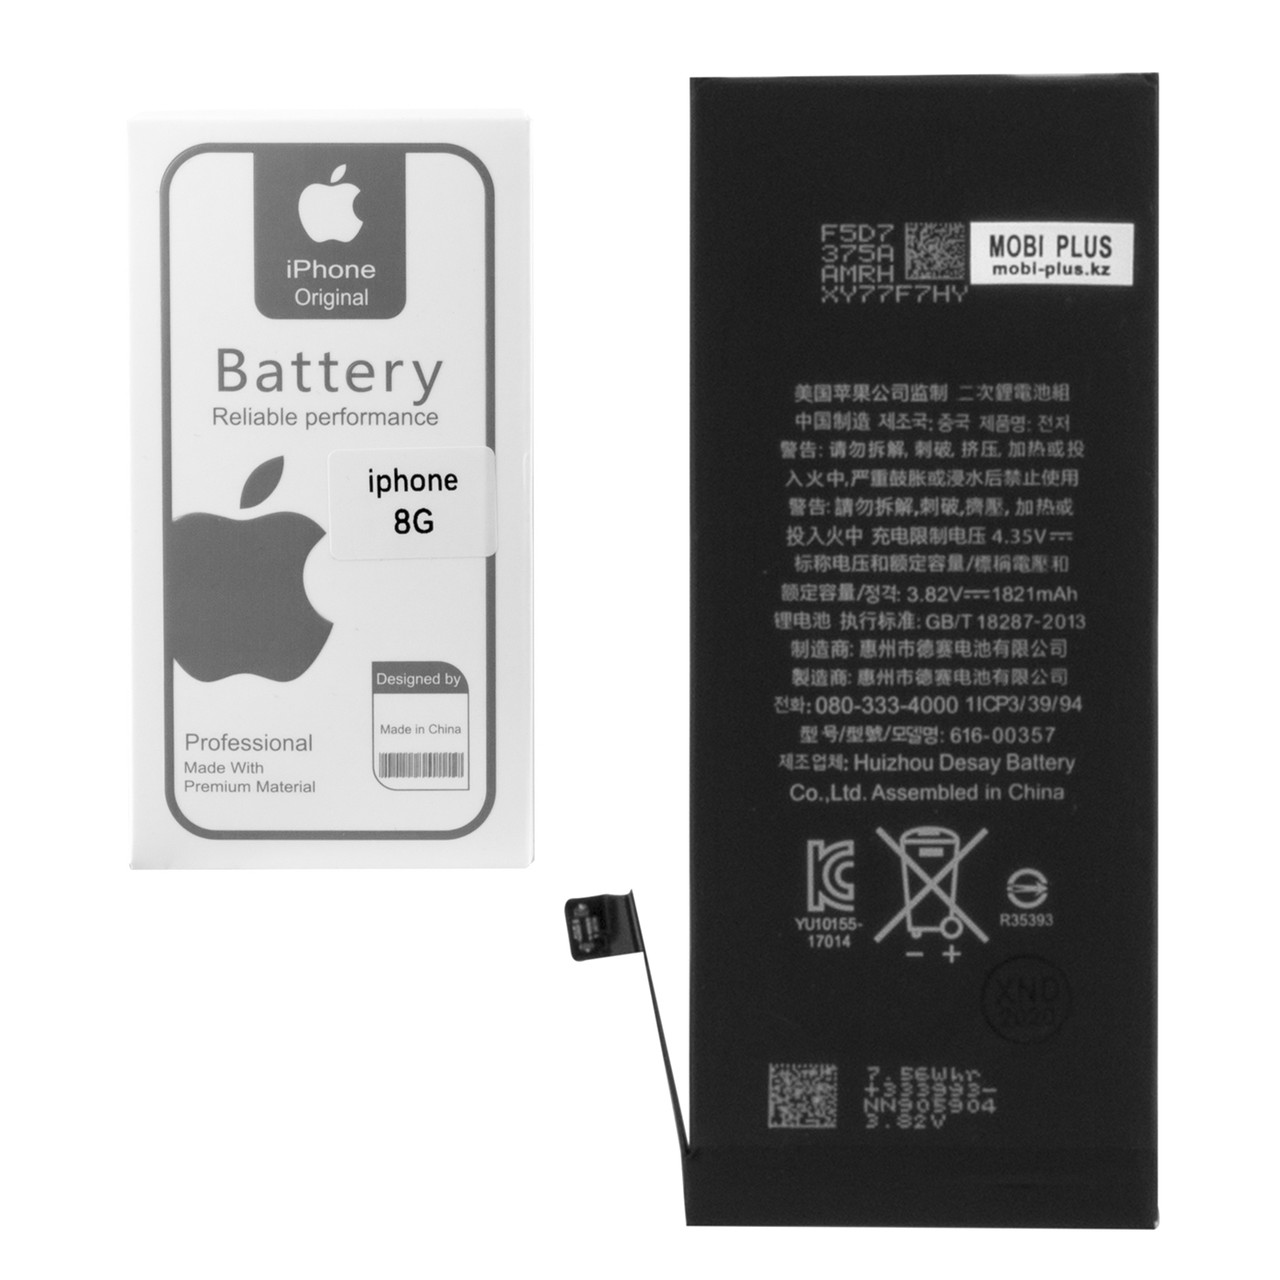 Аккумулятор Apple iPhone 8G 1821mAh GU Electronics